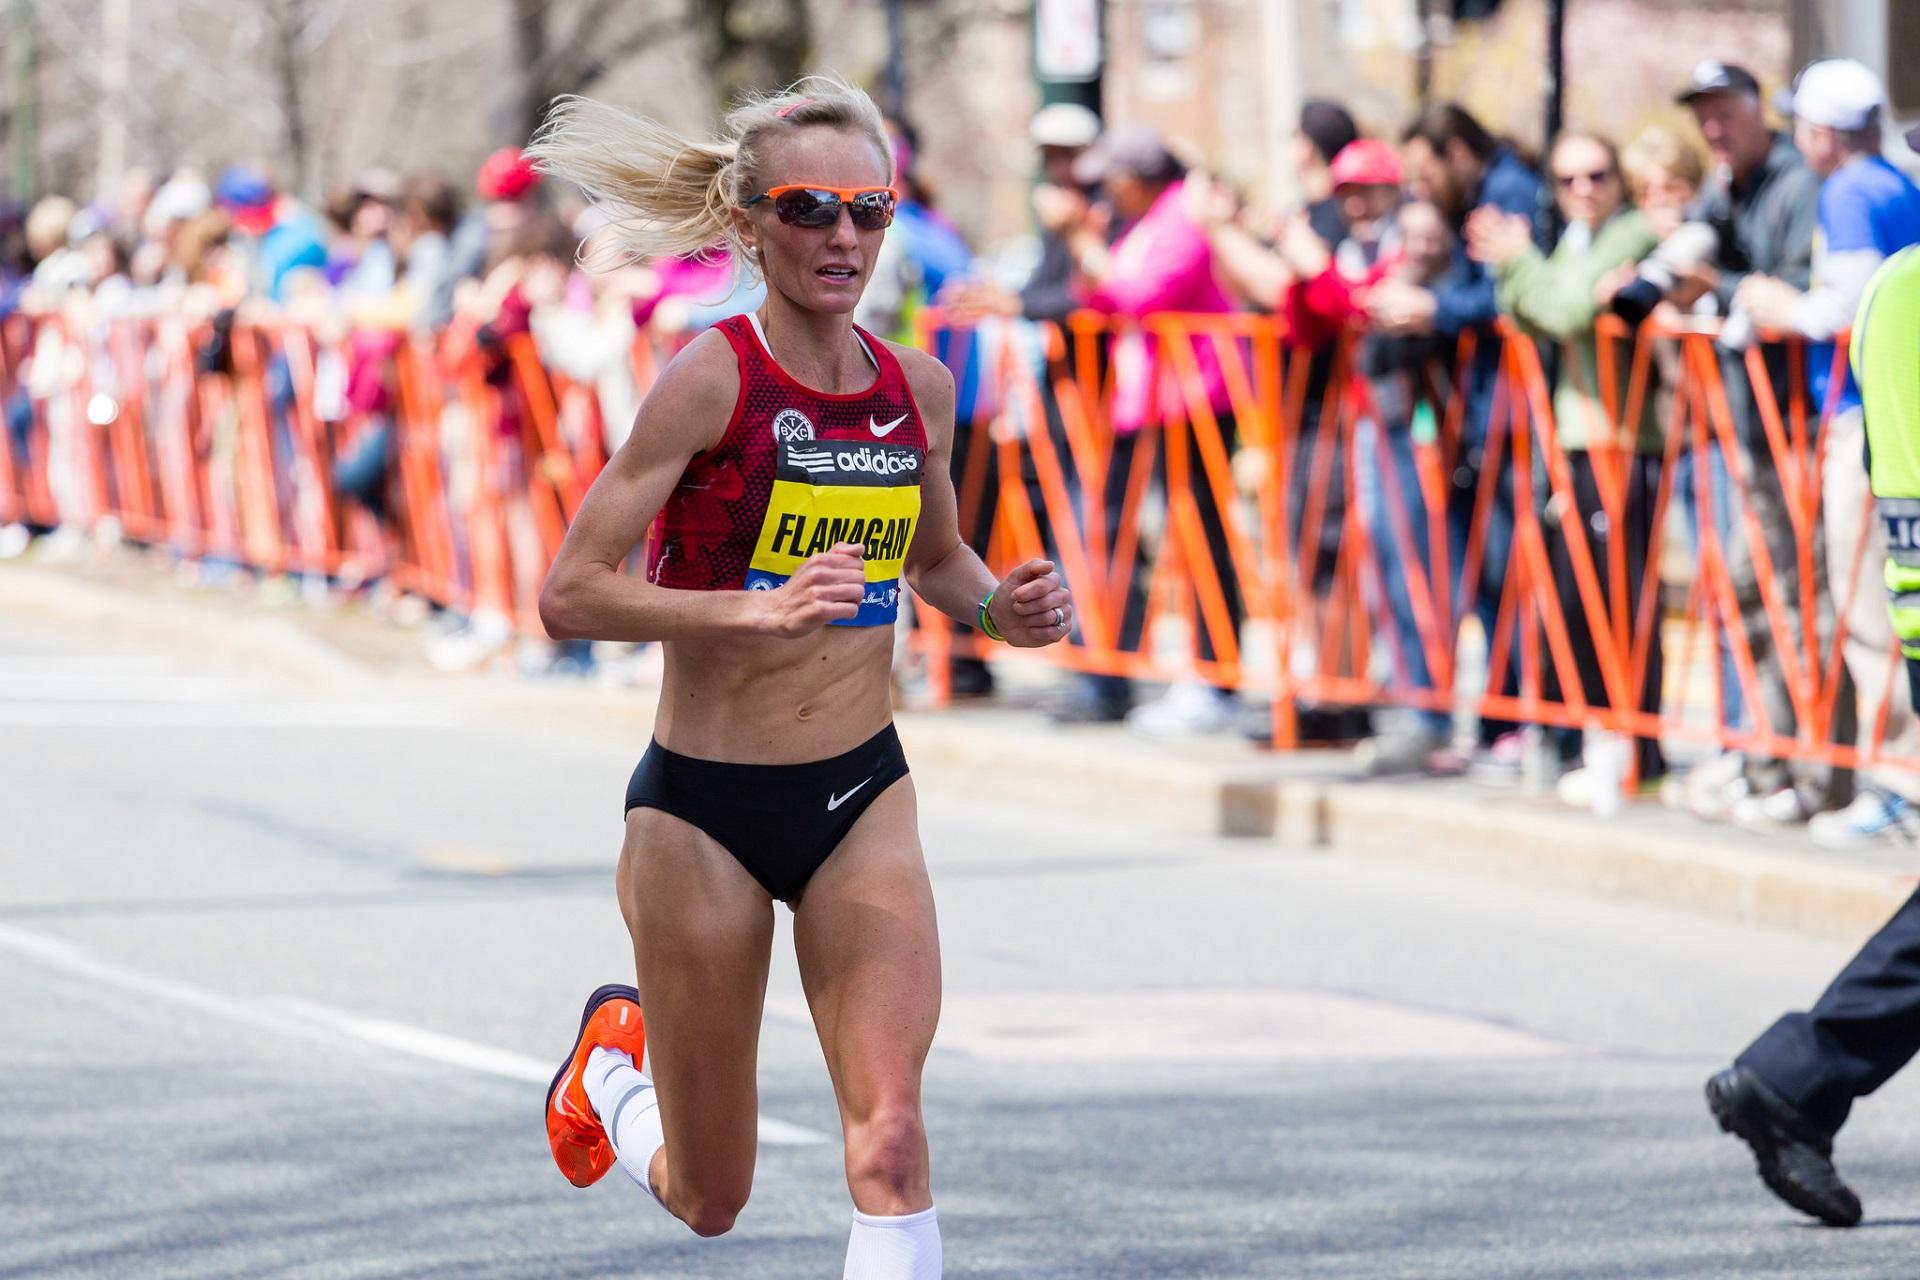 O impacto das lebres na Maratona